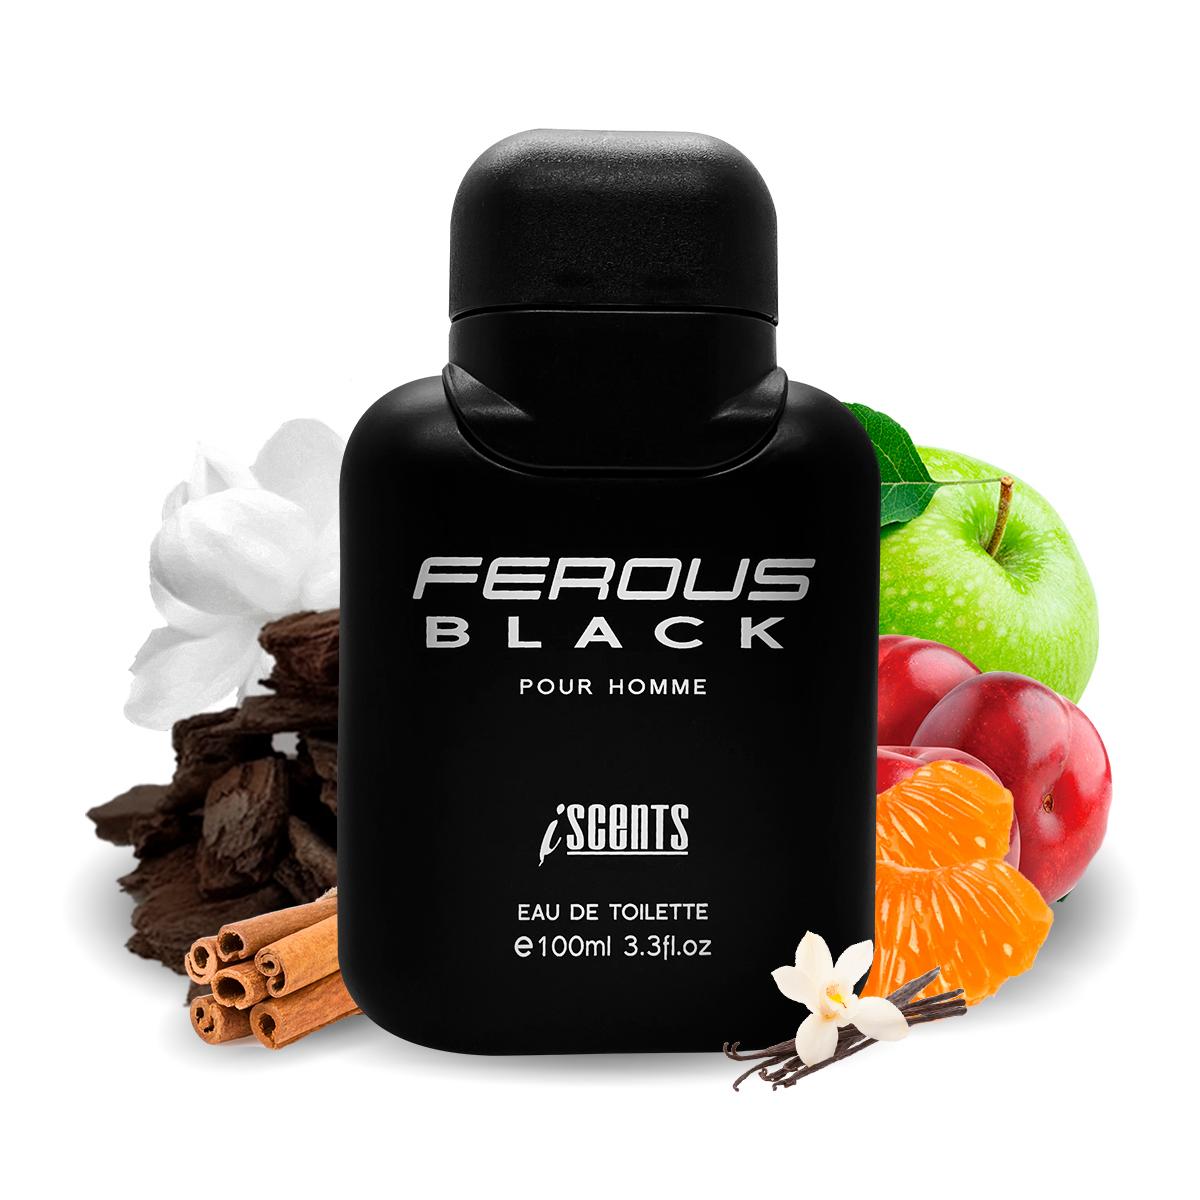 Kit 2 Perfumes Importados Ferous Black e Excess I Scents